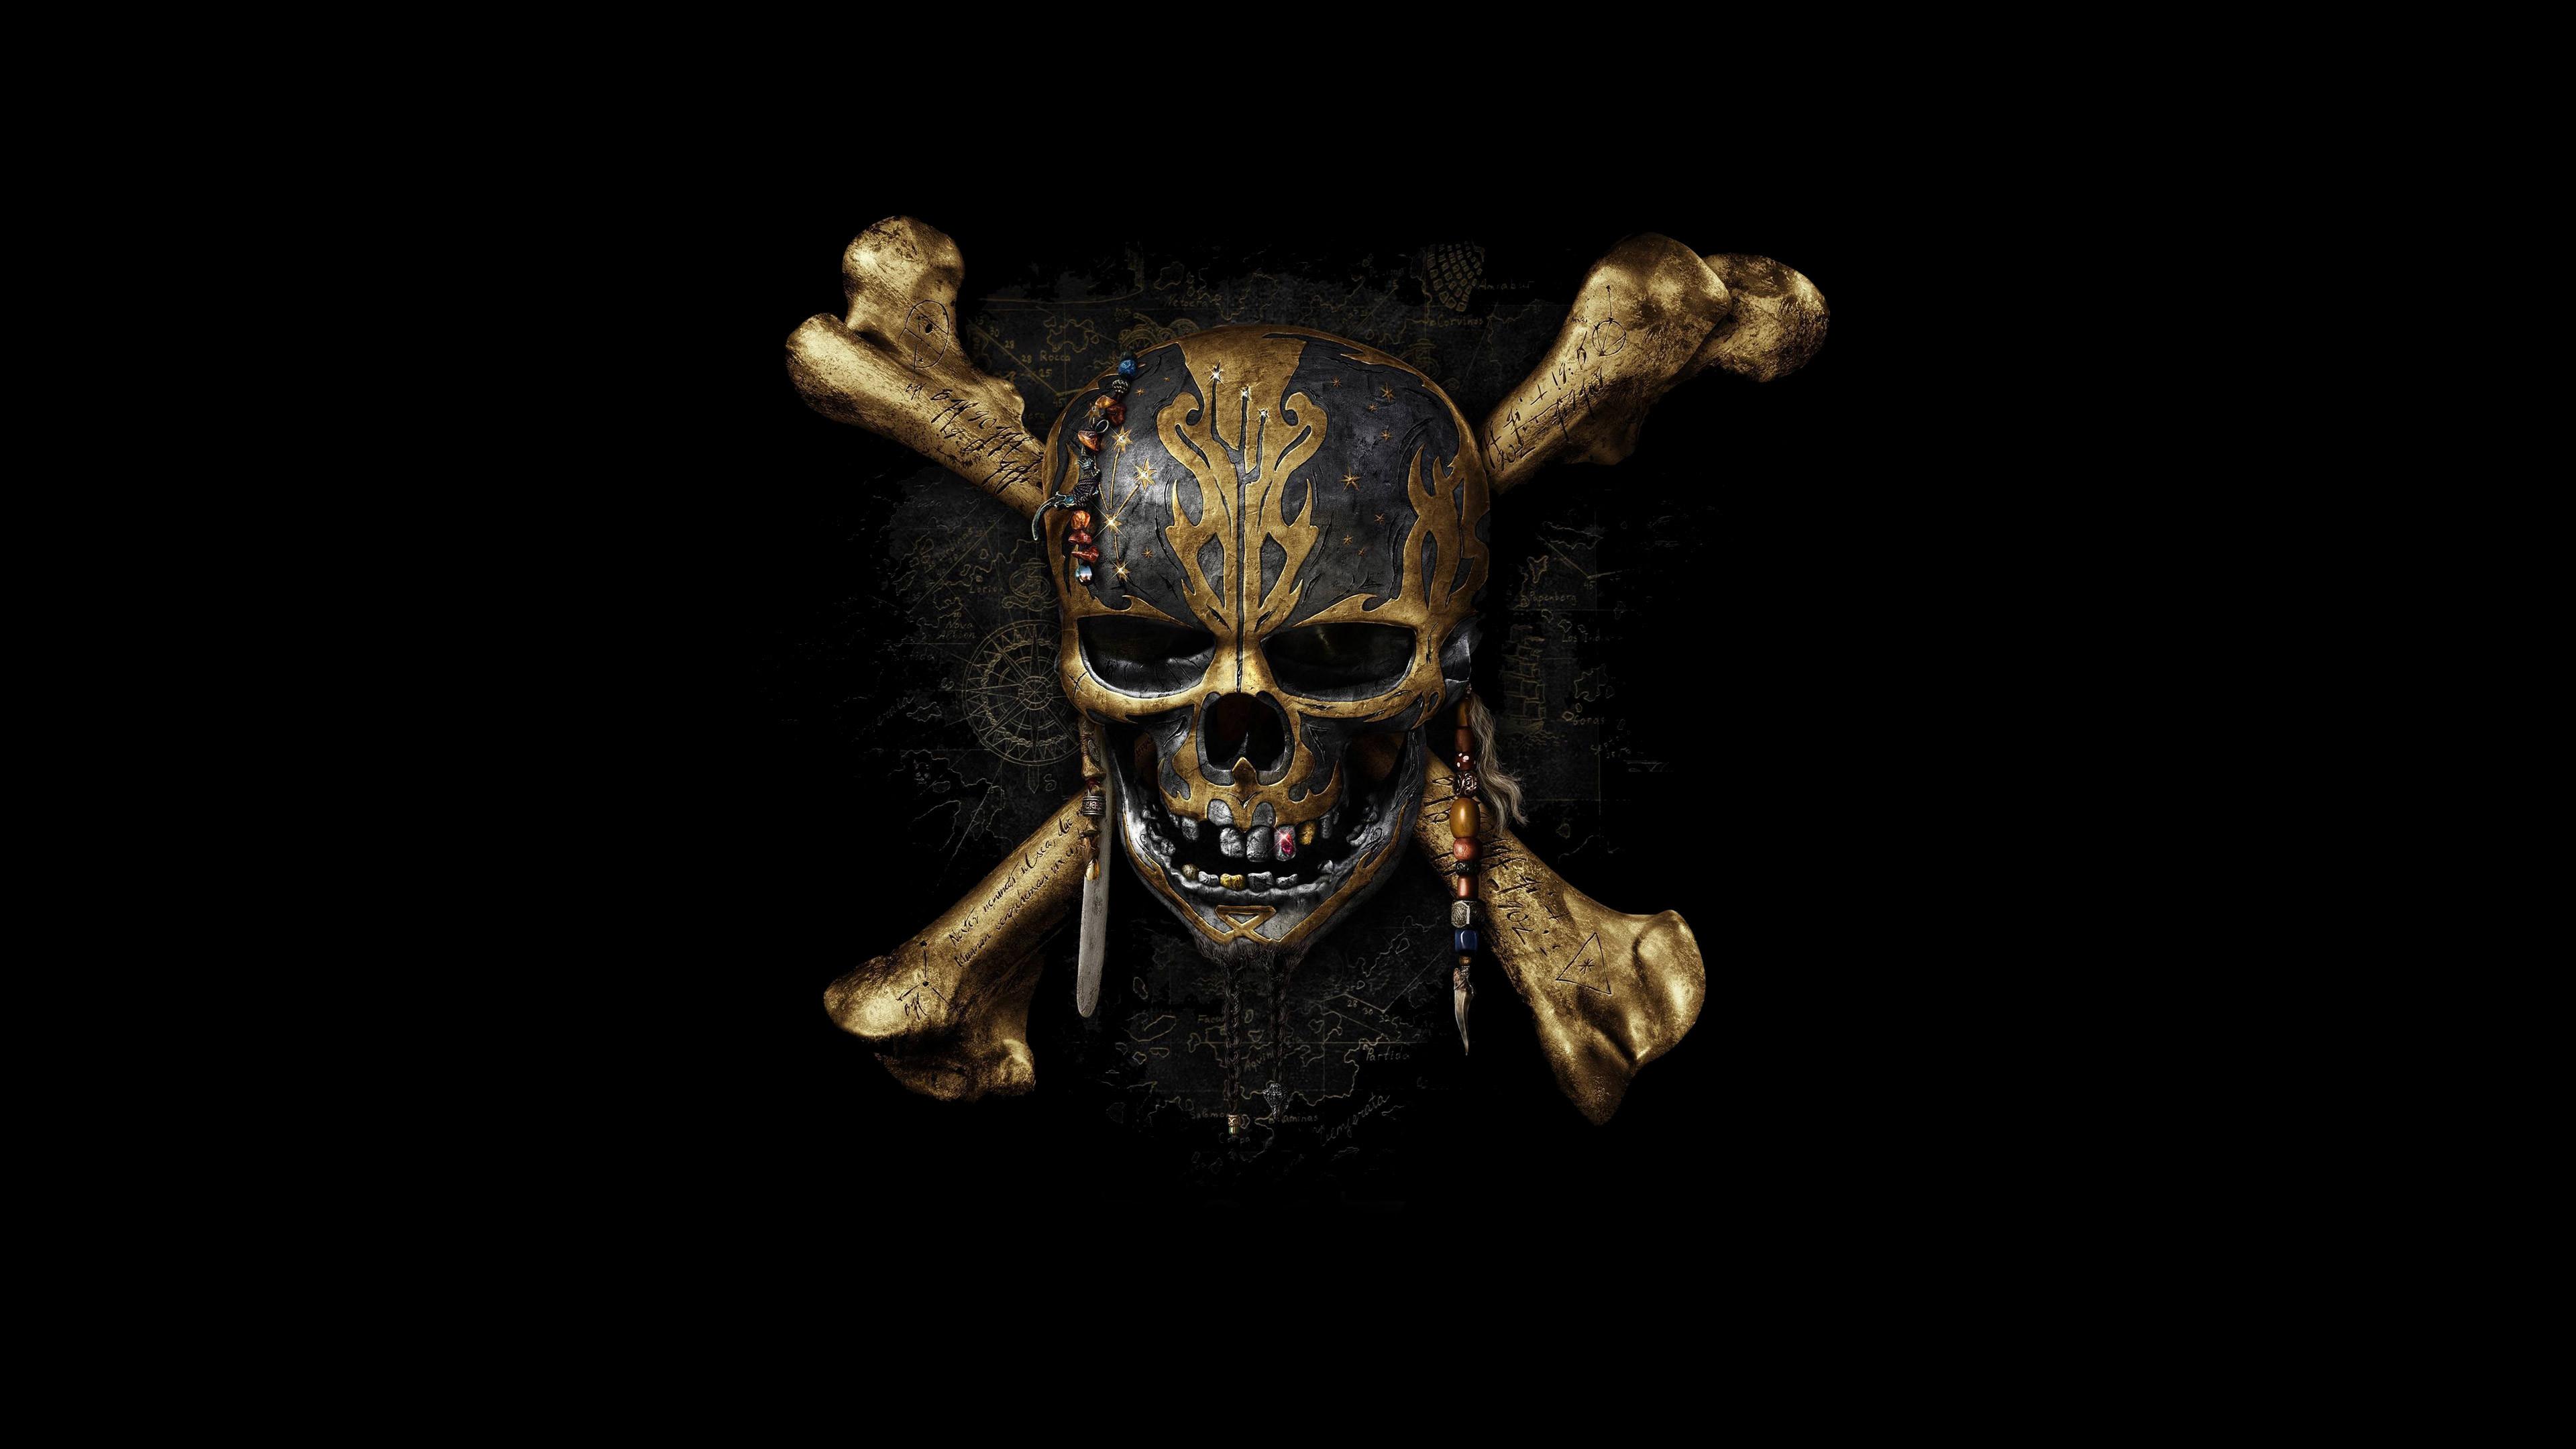 … wallpaper pirates of the caribbean dead men tell no tales 2017 …